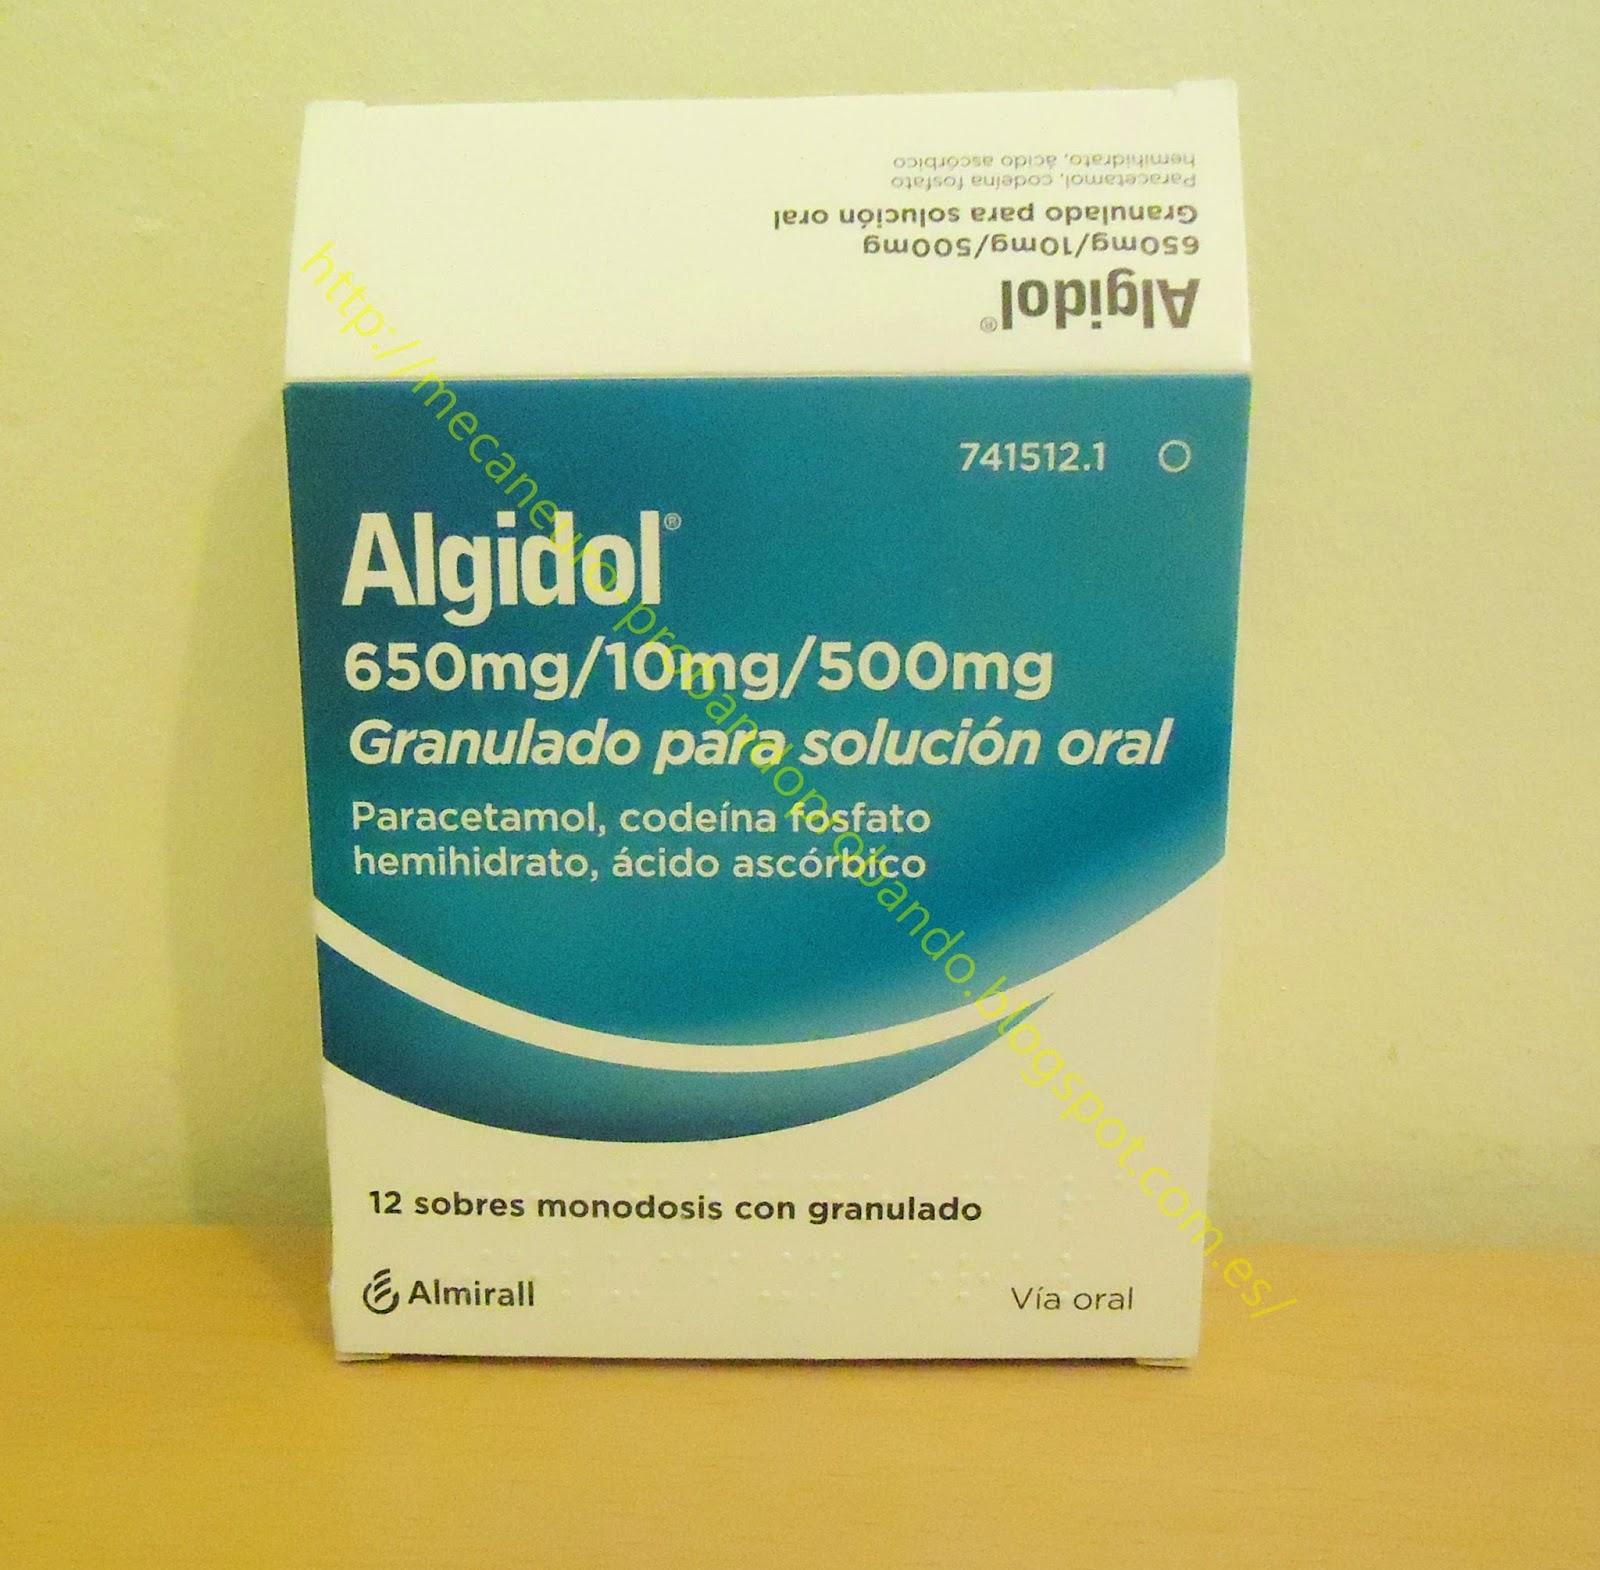 Algidol 650mg Granulado para solución oral